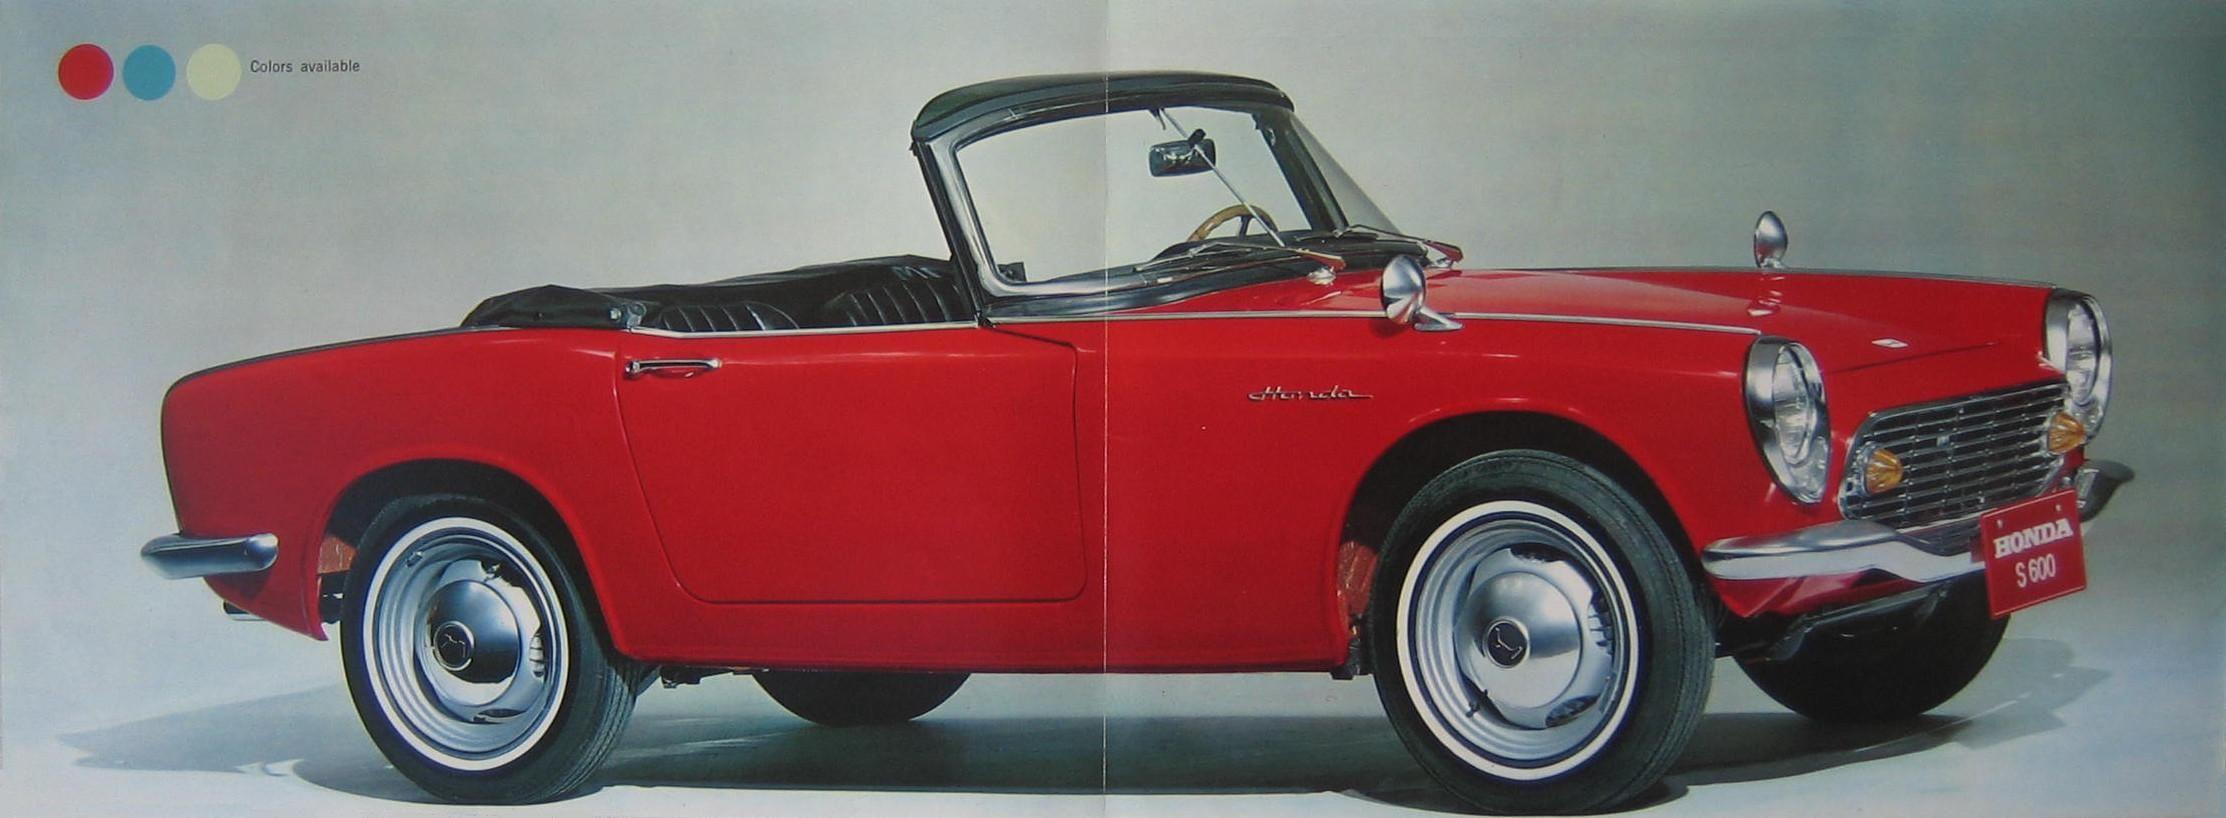 89d2914c44 1964 HONDA S600 brochure.GB 03+04